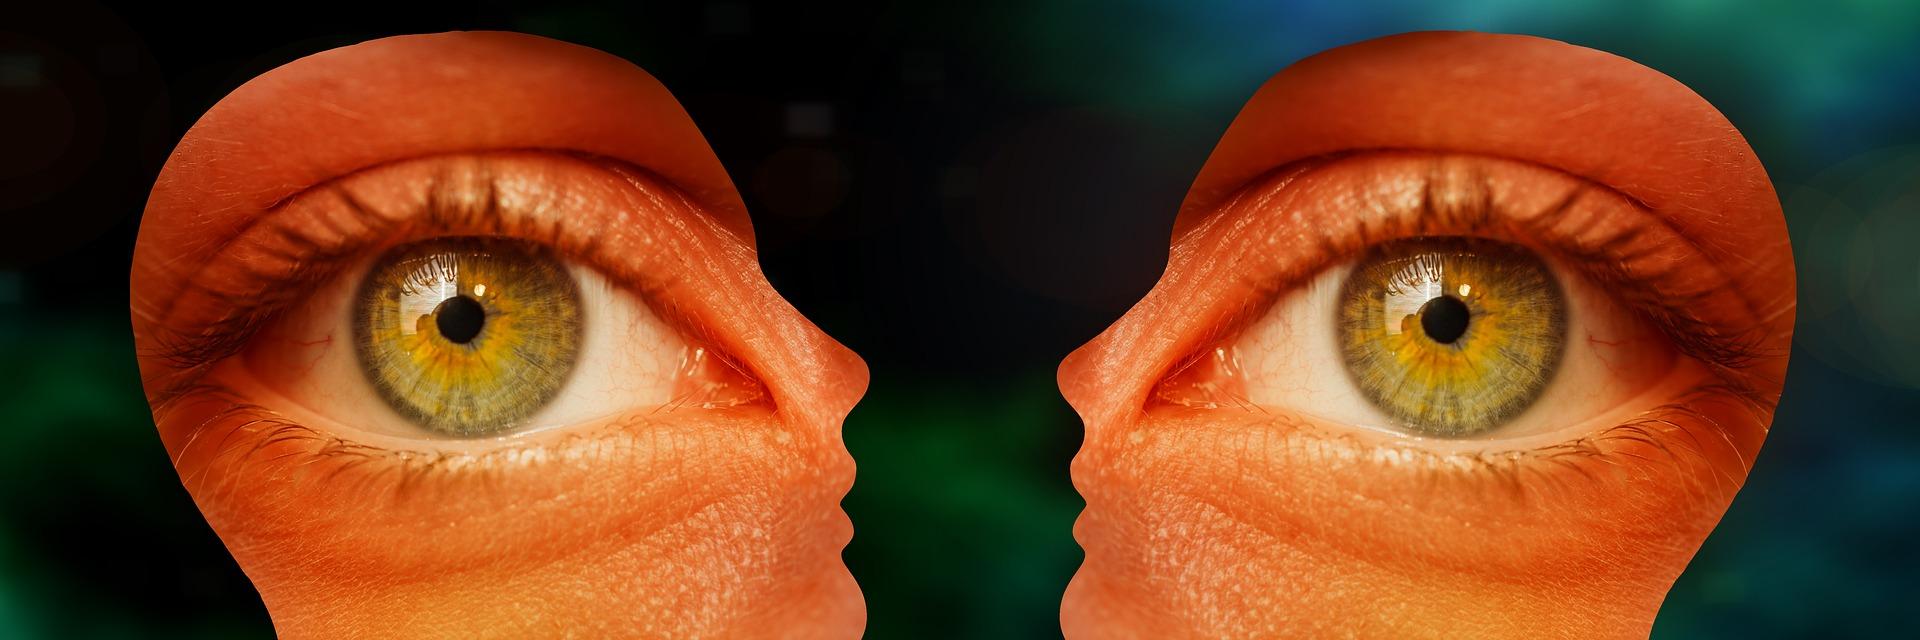 InSightOut - Hypnoanalyse en Psychoanalyse